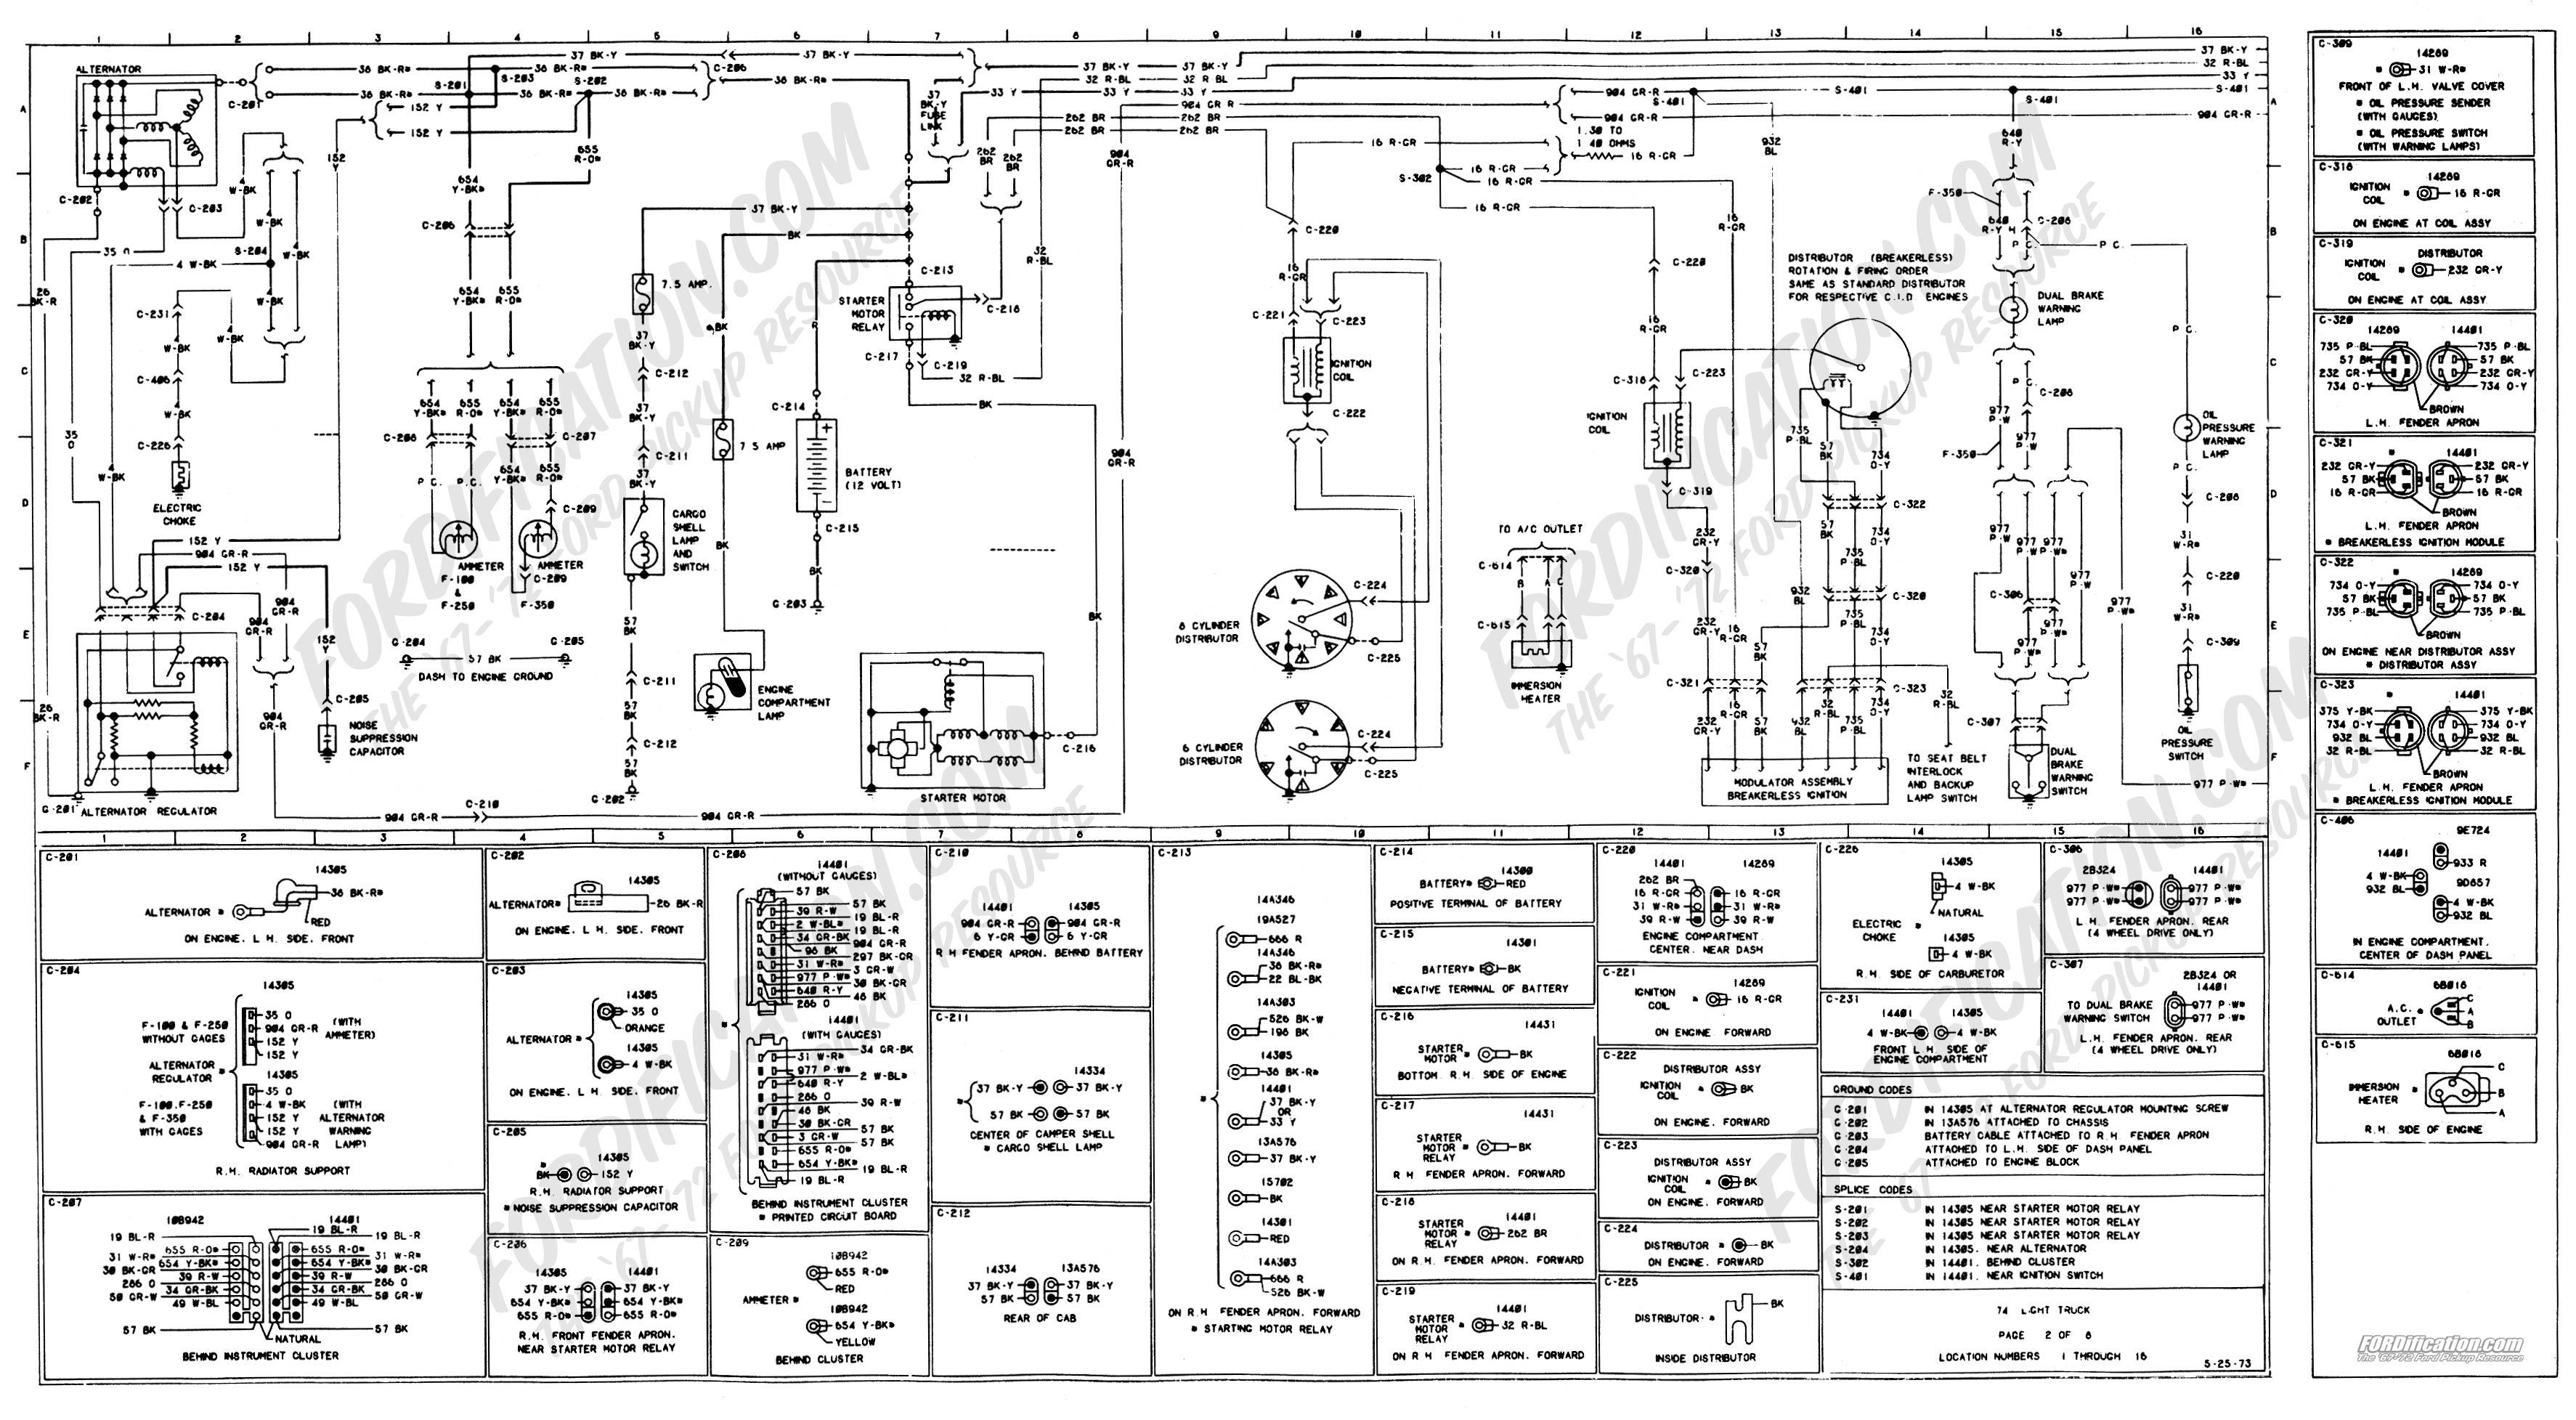 Ford Wiring Diagrams Wrg 4274 Ford 6000 Wiring Diagram